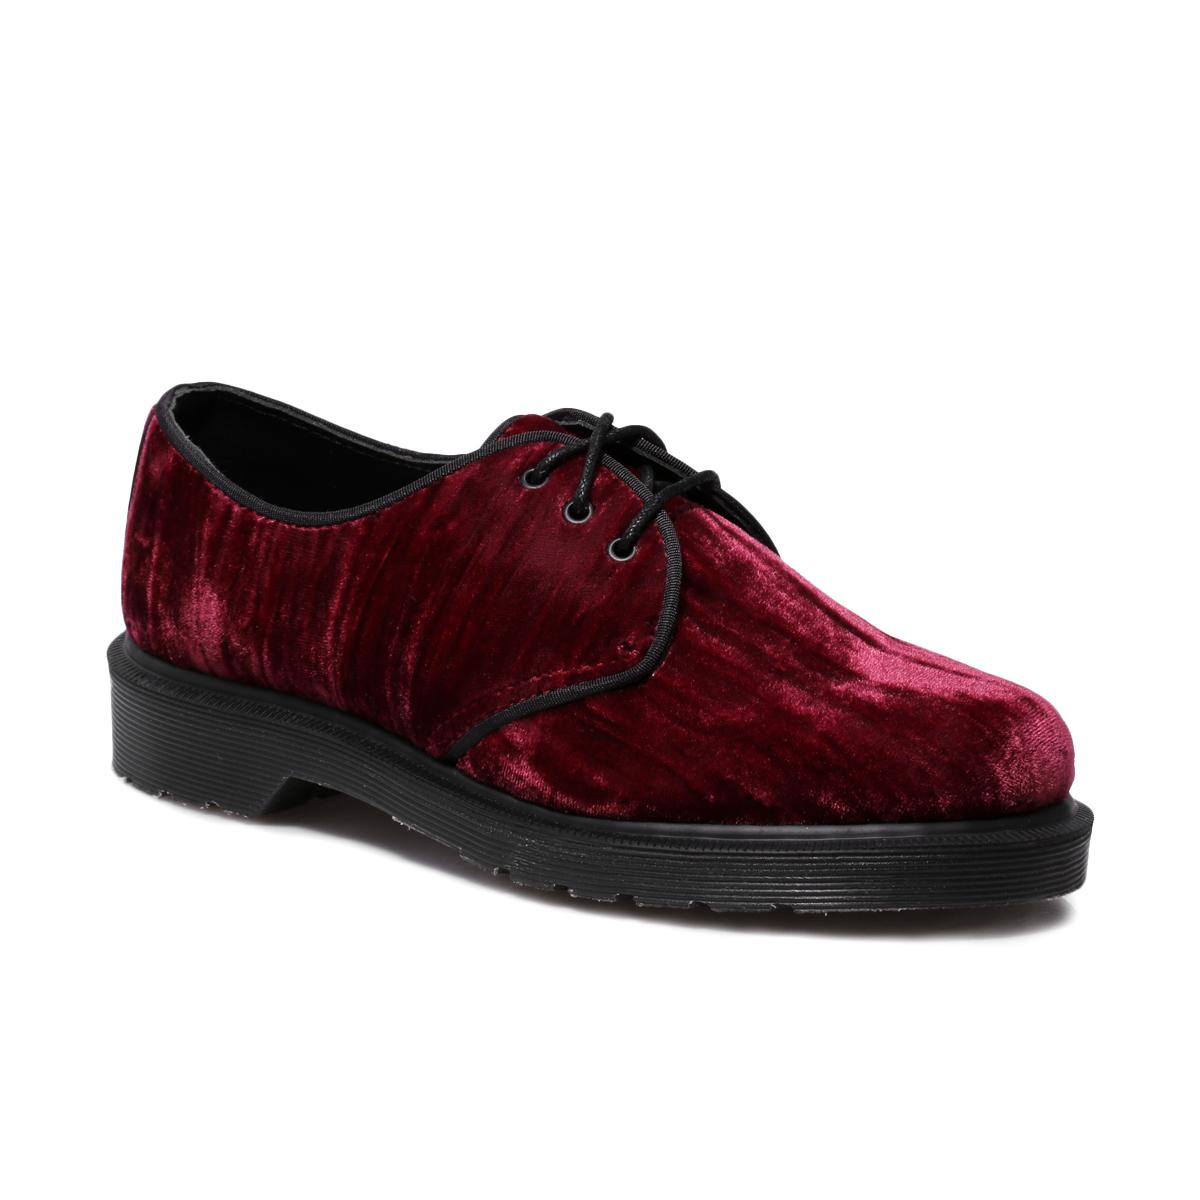 Dr Martens 1461 Hugh Cherry Red Crushed Velvet Mens Womens Boots ...